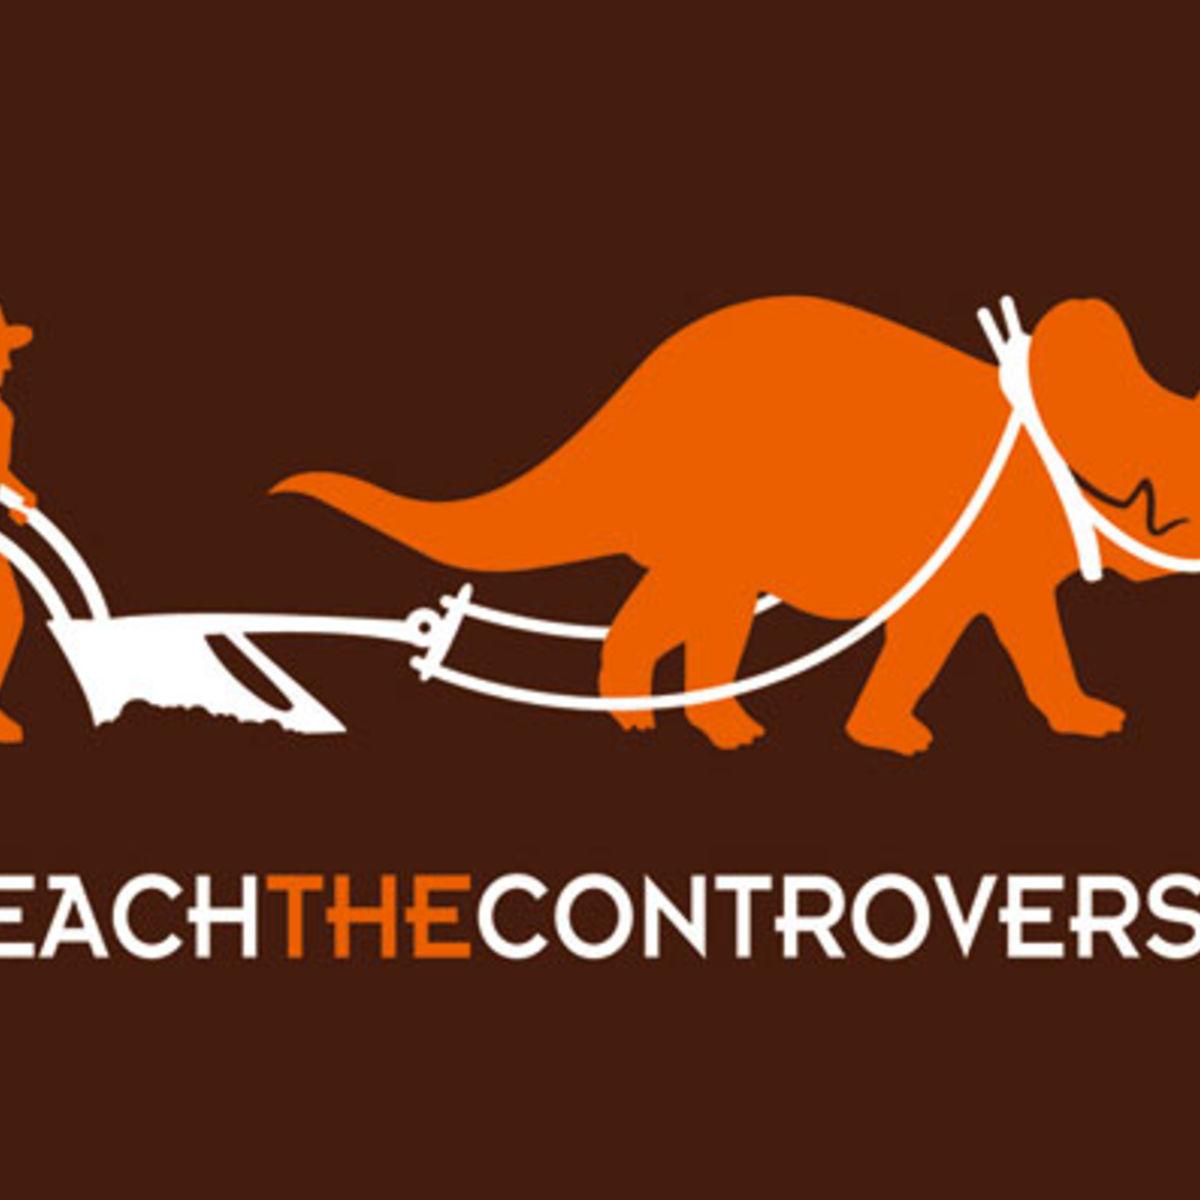 teachthecontroversy_humandinos.jpg